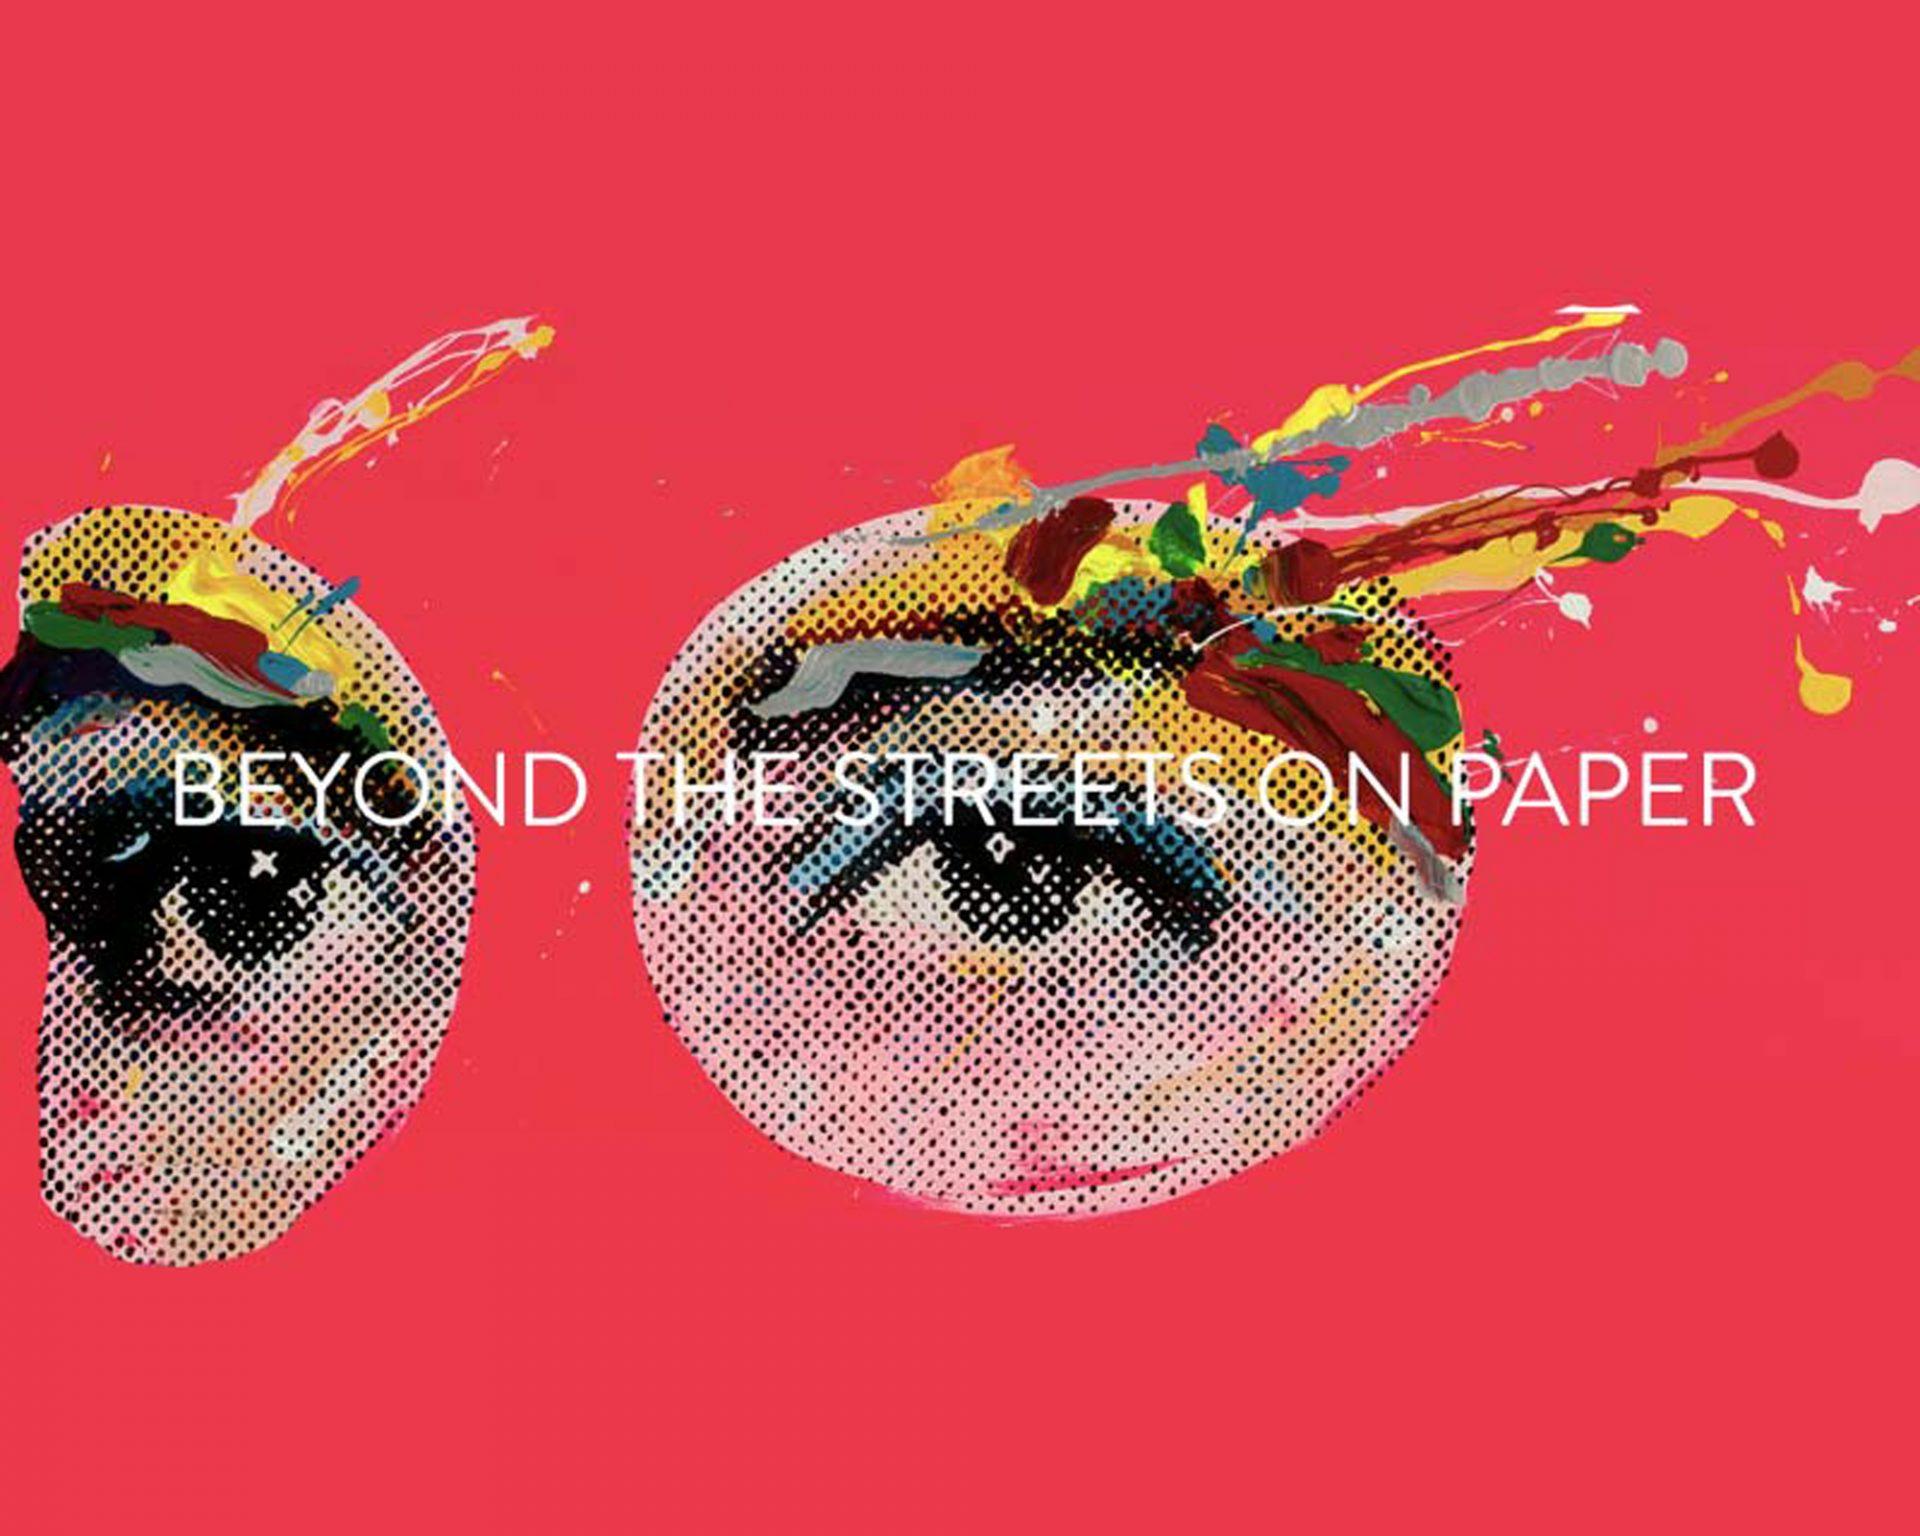 Umar Rashid: Beyond the Streets on Paper